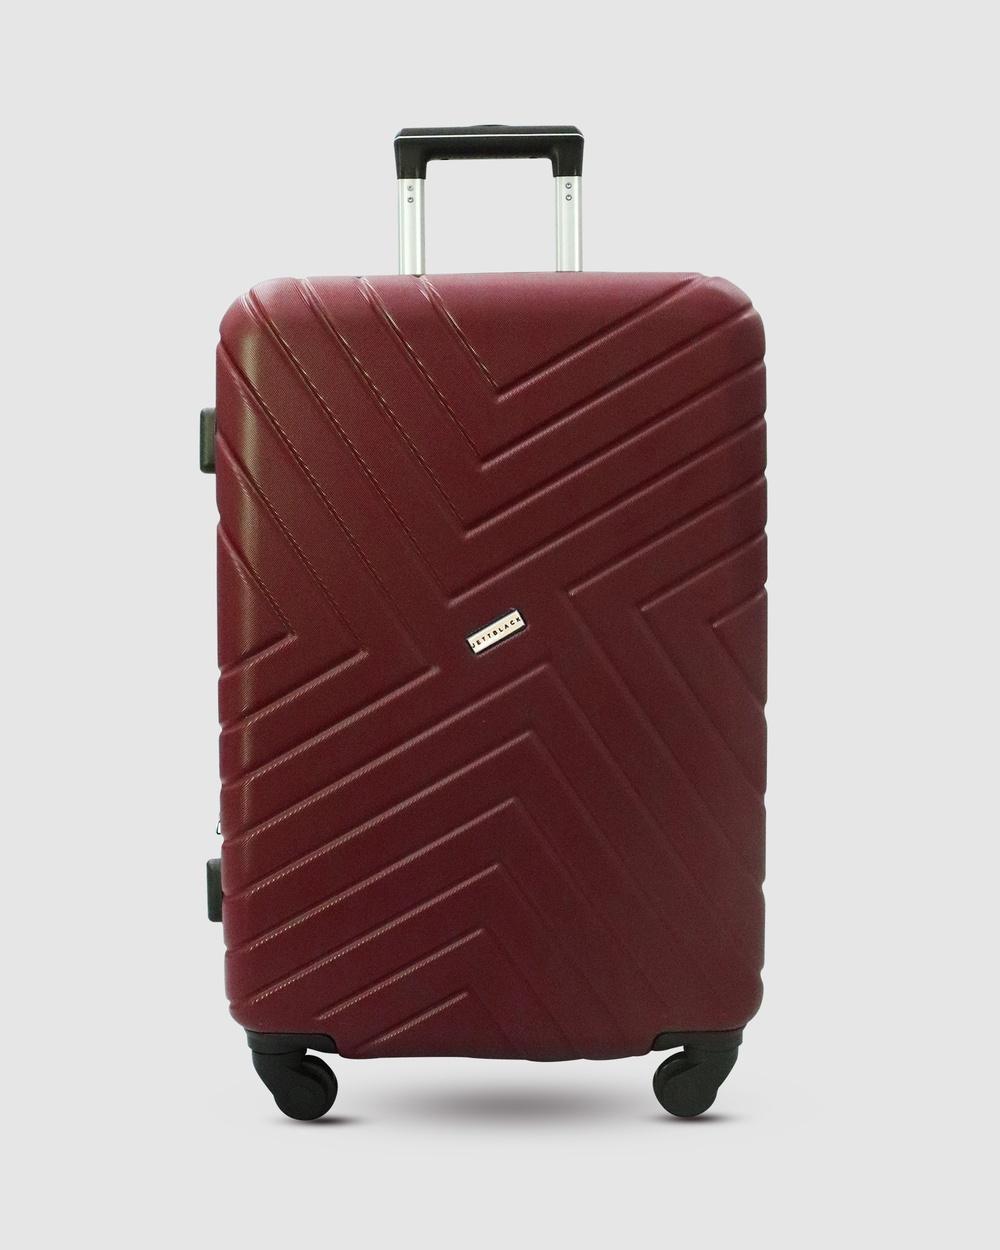 JETT BLACK Merlot Maze Large Suitcase Bags Red